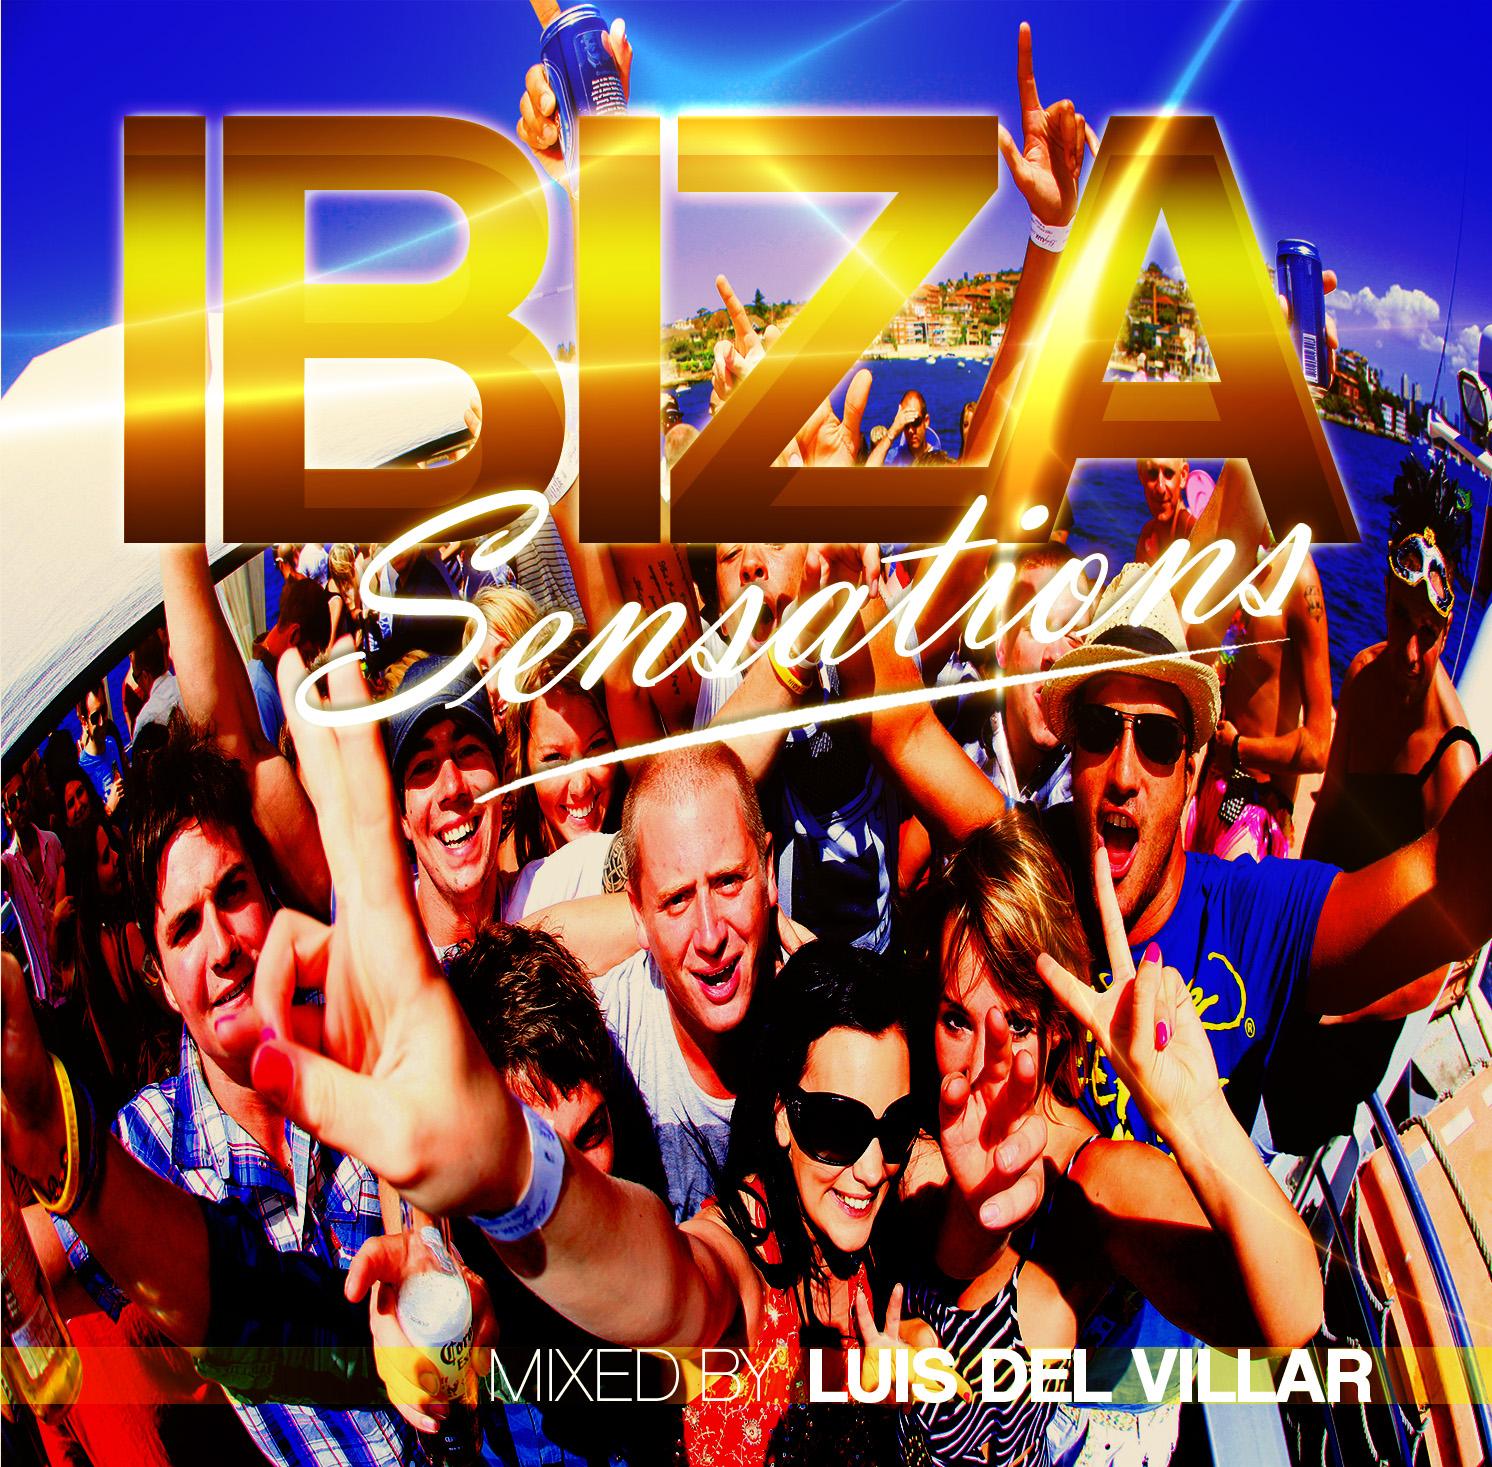 Artwork for Ibiza Sensations 80